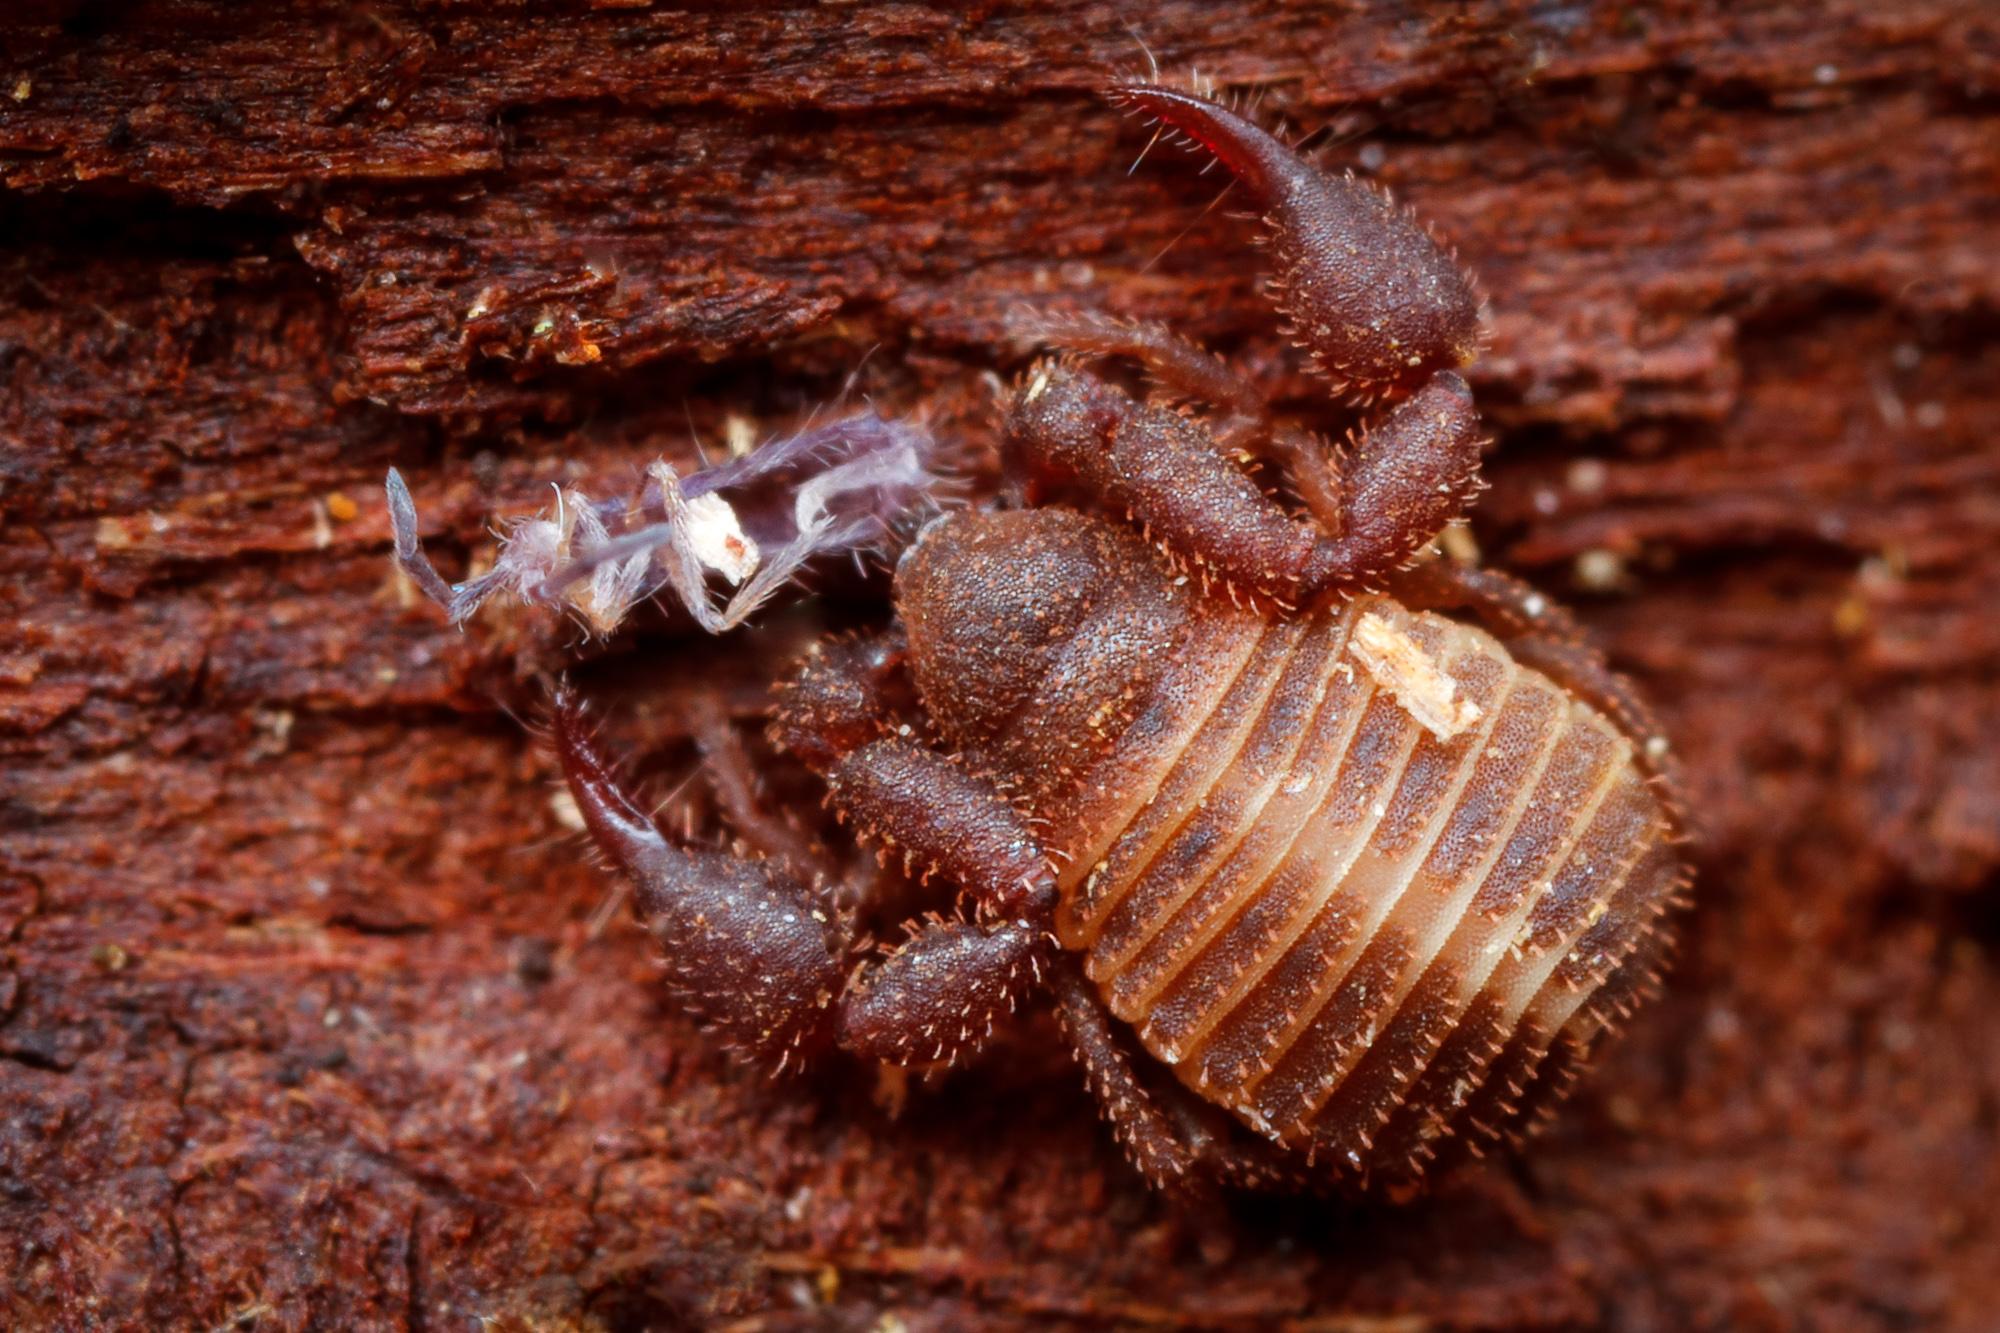 Chernes cimicoides, rutklokrypare